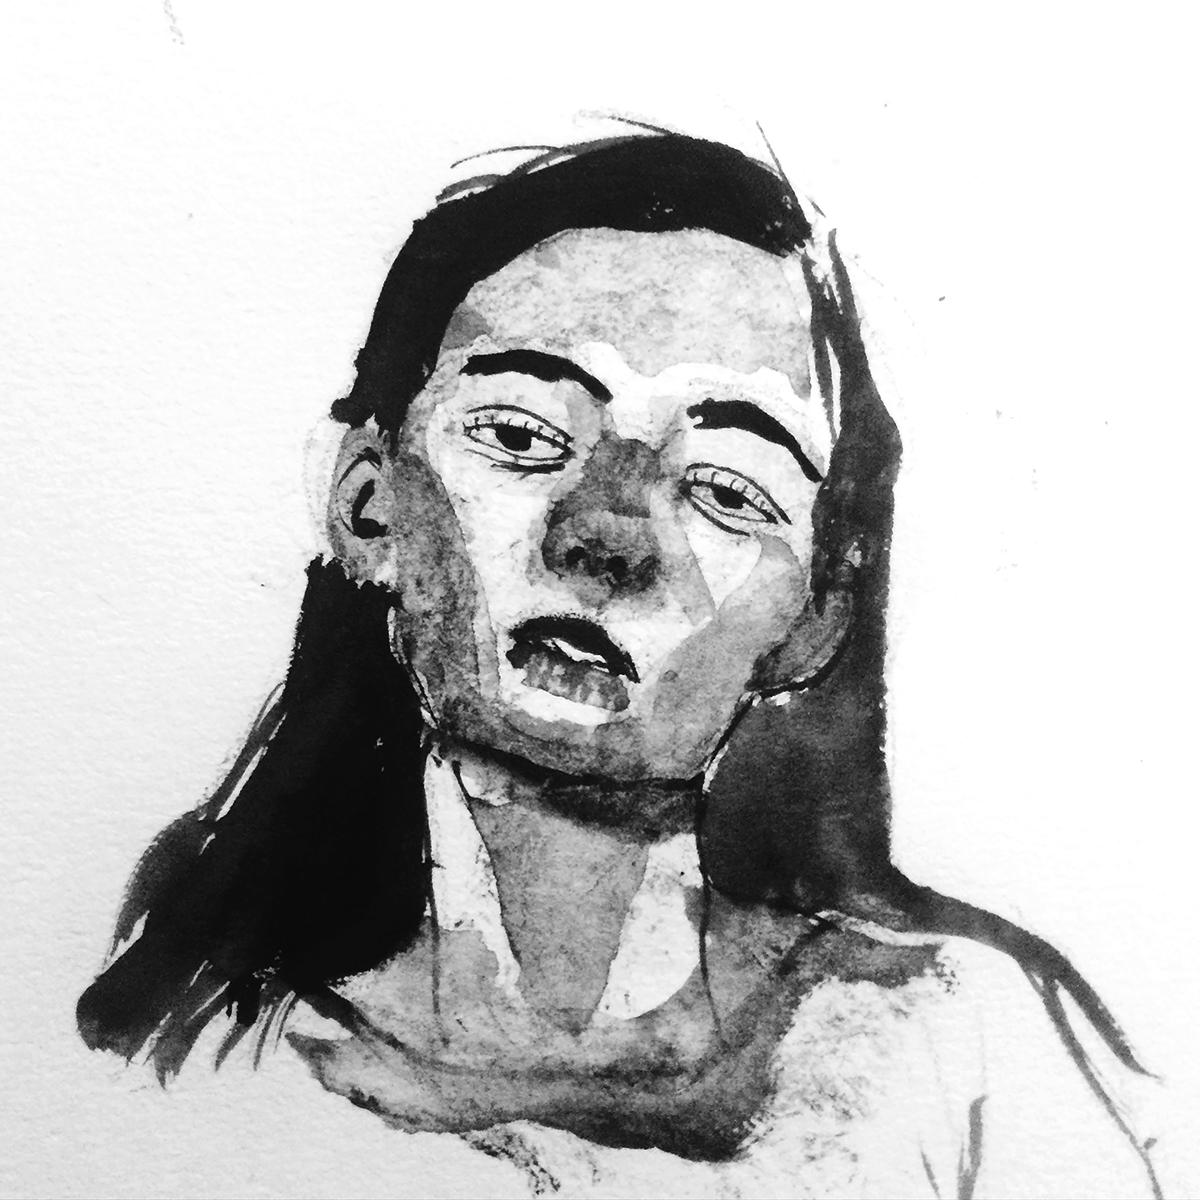 Self-portrait by Michael Skeet